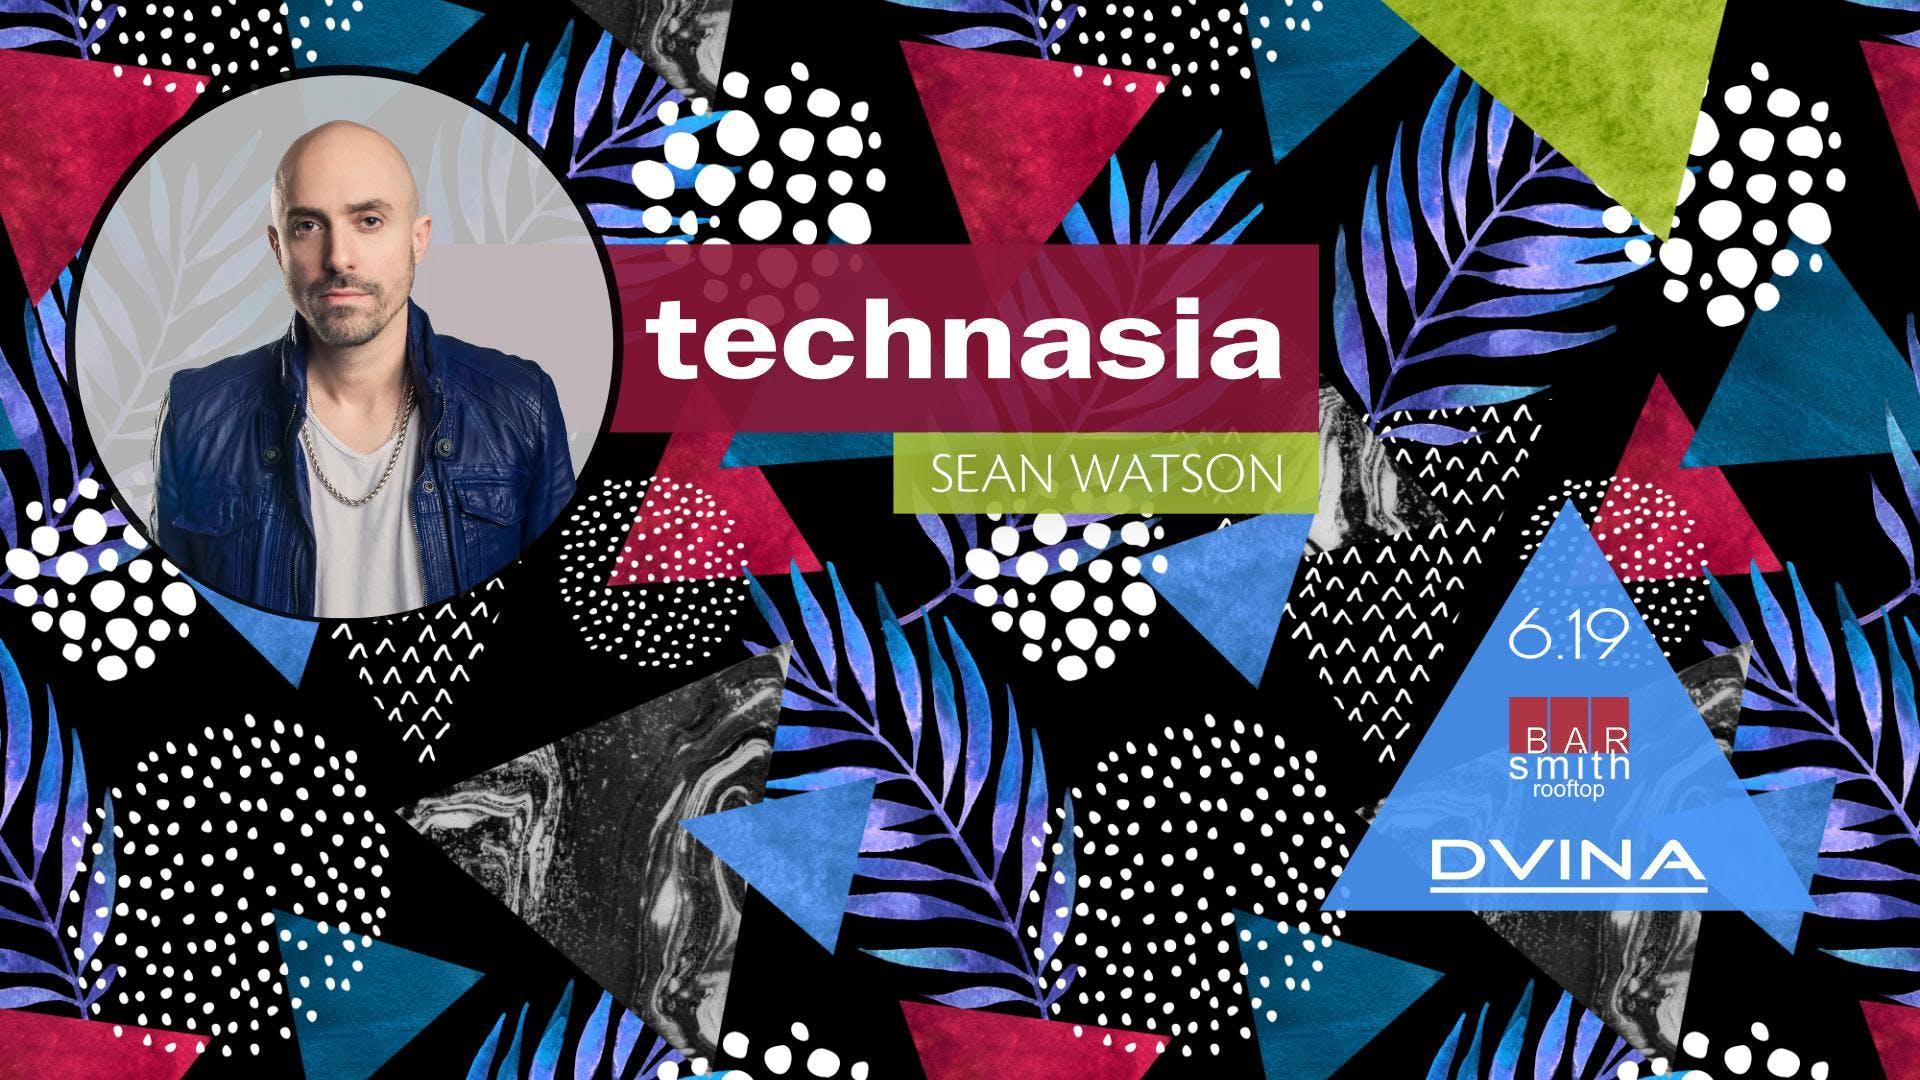 DVINA Wednesdays: Technasia